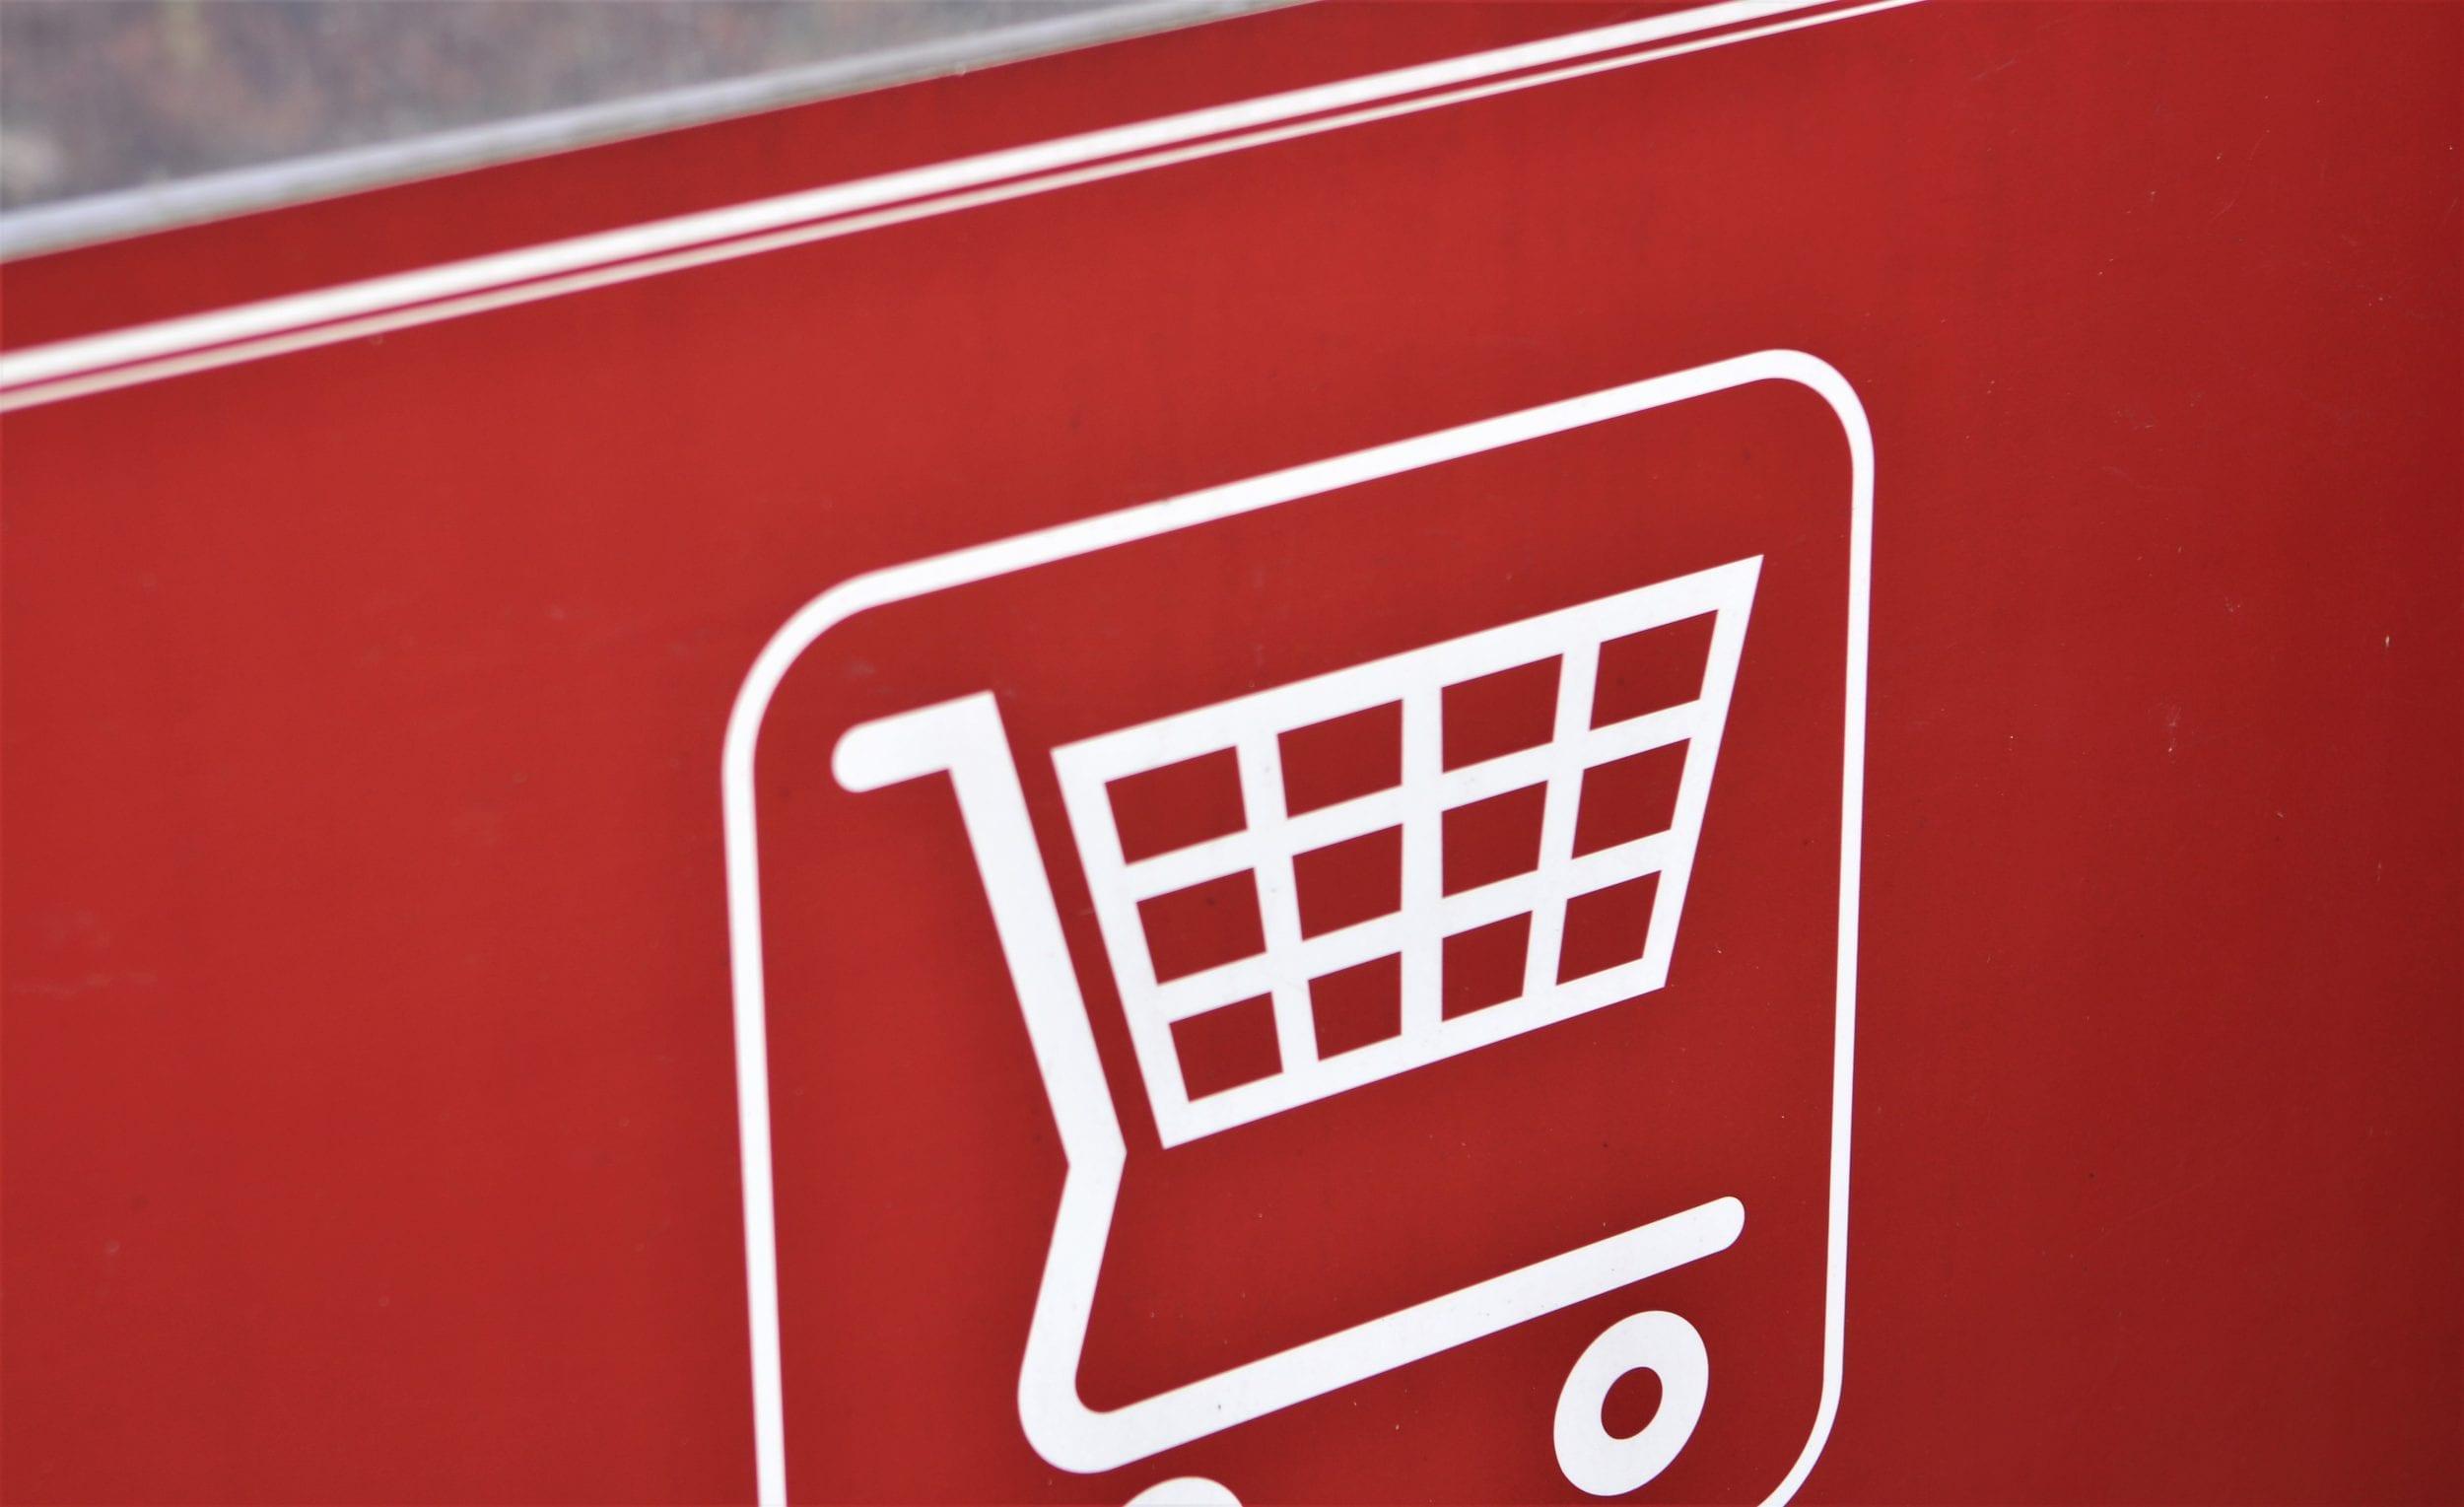 Frederiksberg Kommune sikrer at dagligvarer kommer uhindret frem